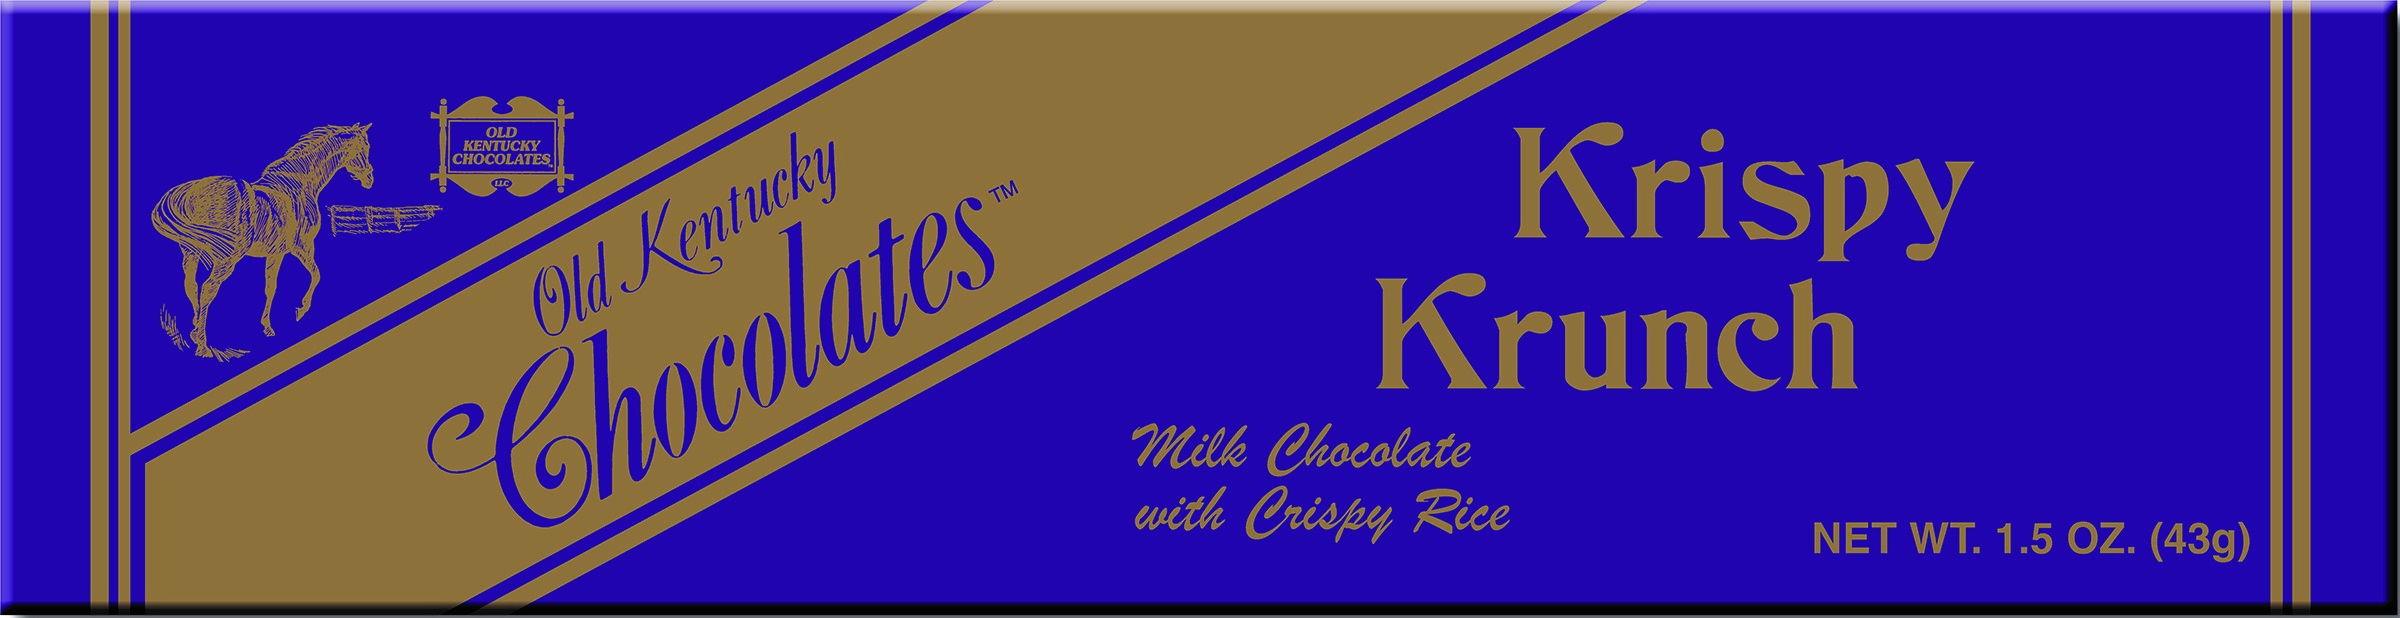 Old Kentucky Chocolates Krispy Krunch Fundraising